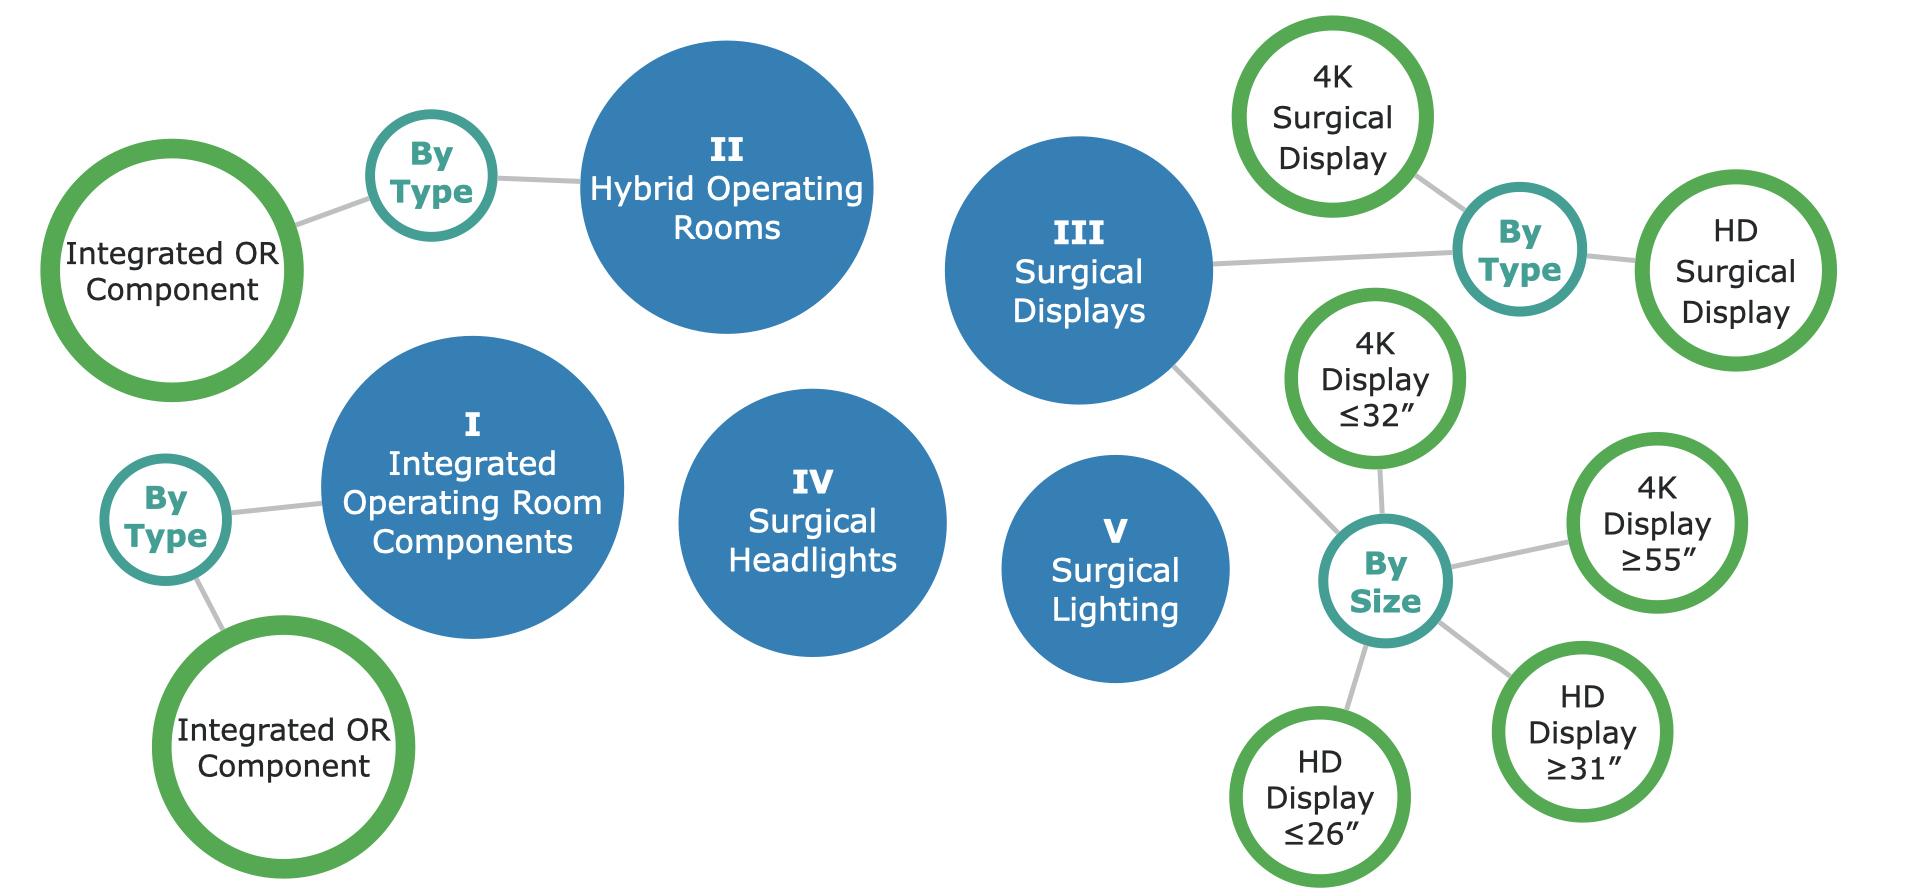 Canadian Operating Equipment Market Segments - p1